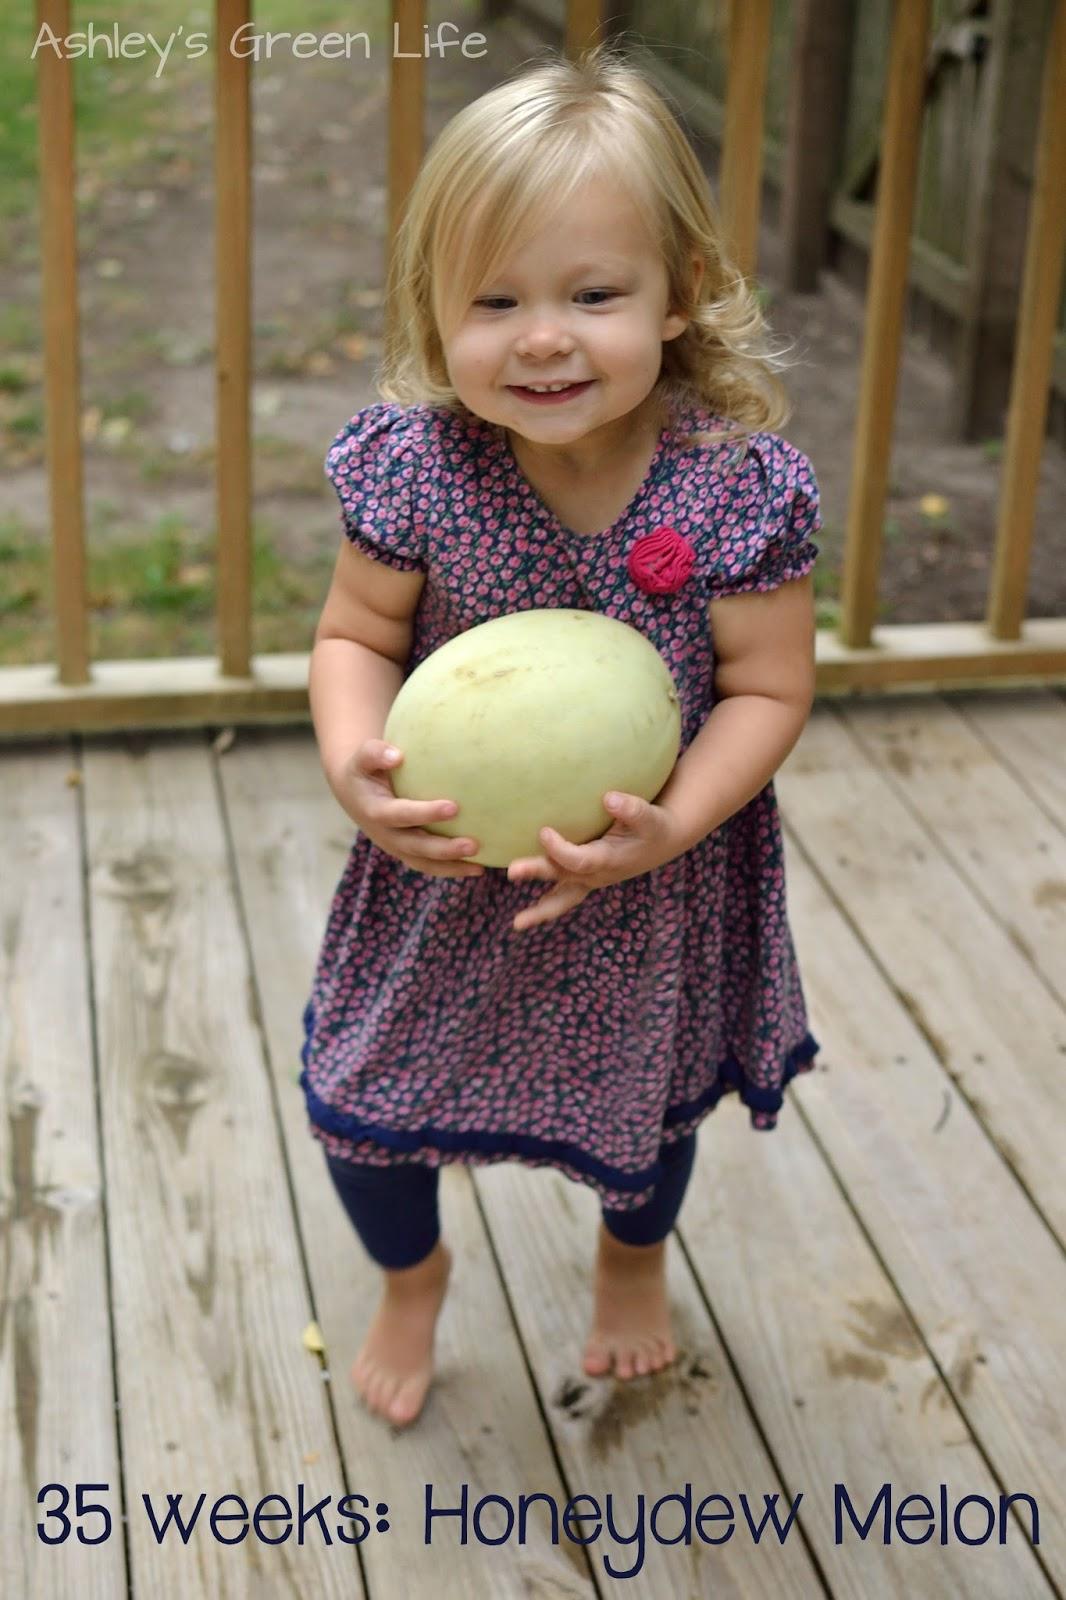 Ashley's Green Life: 35 weeks